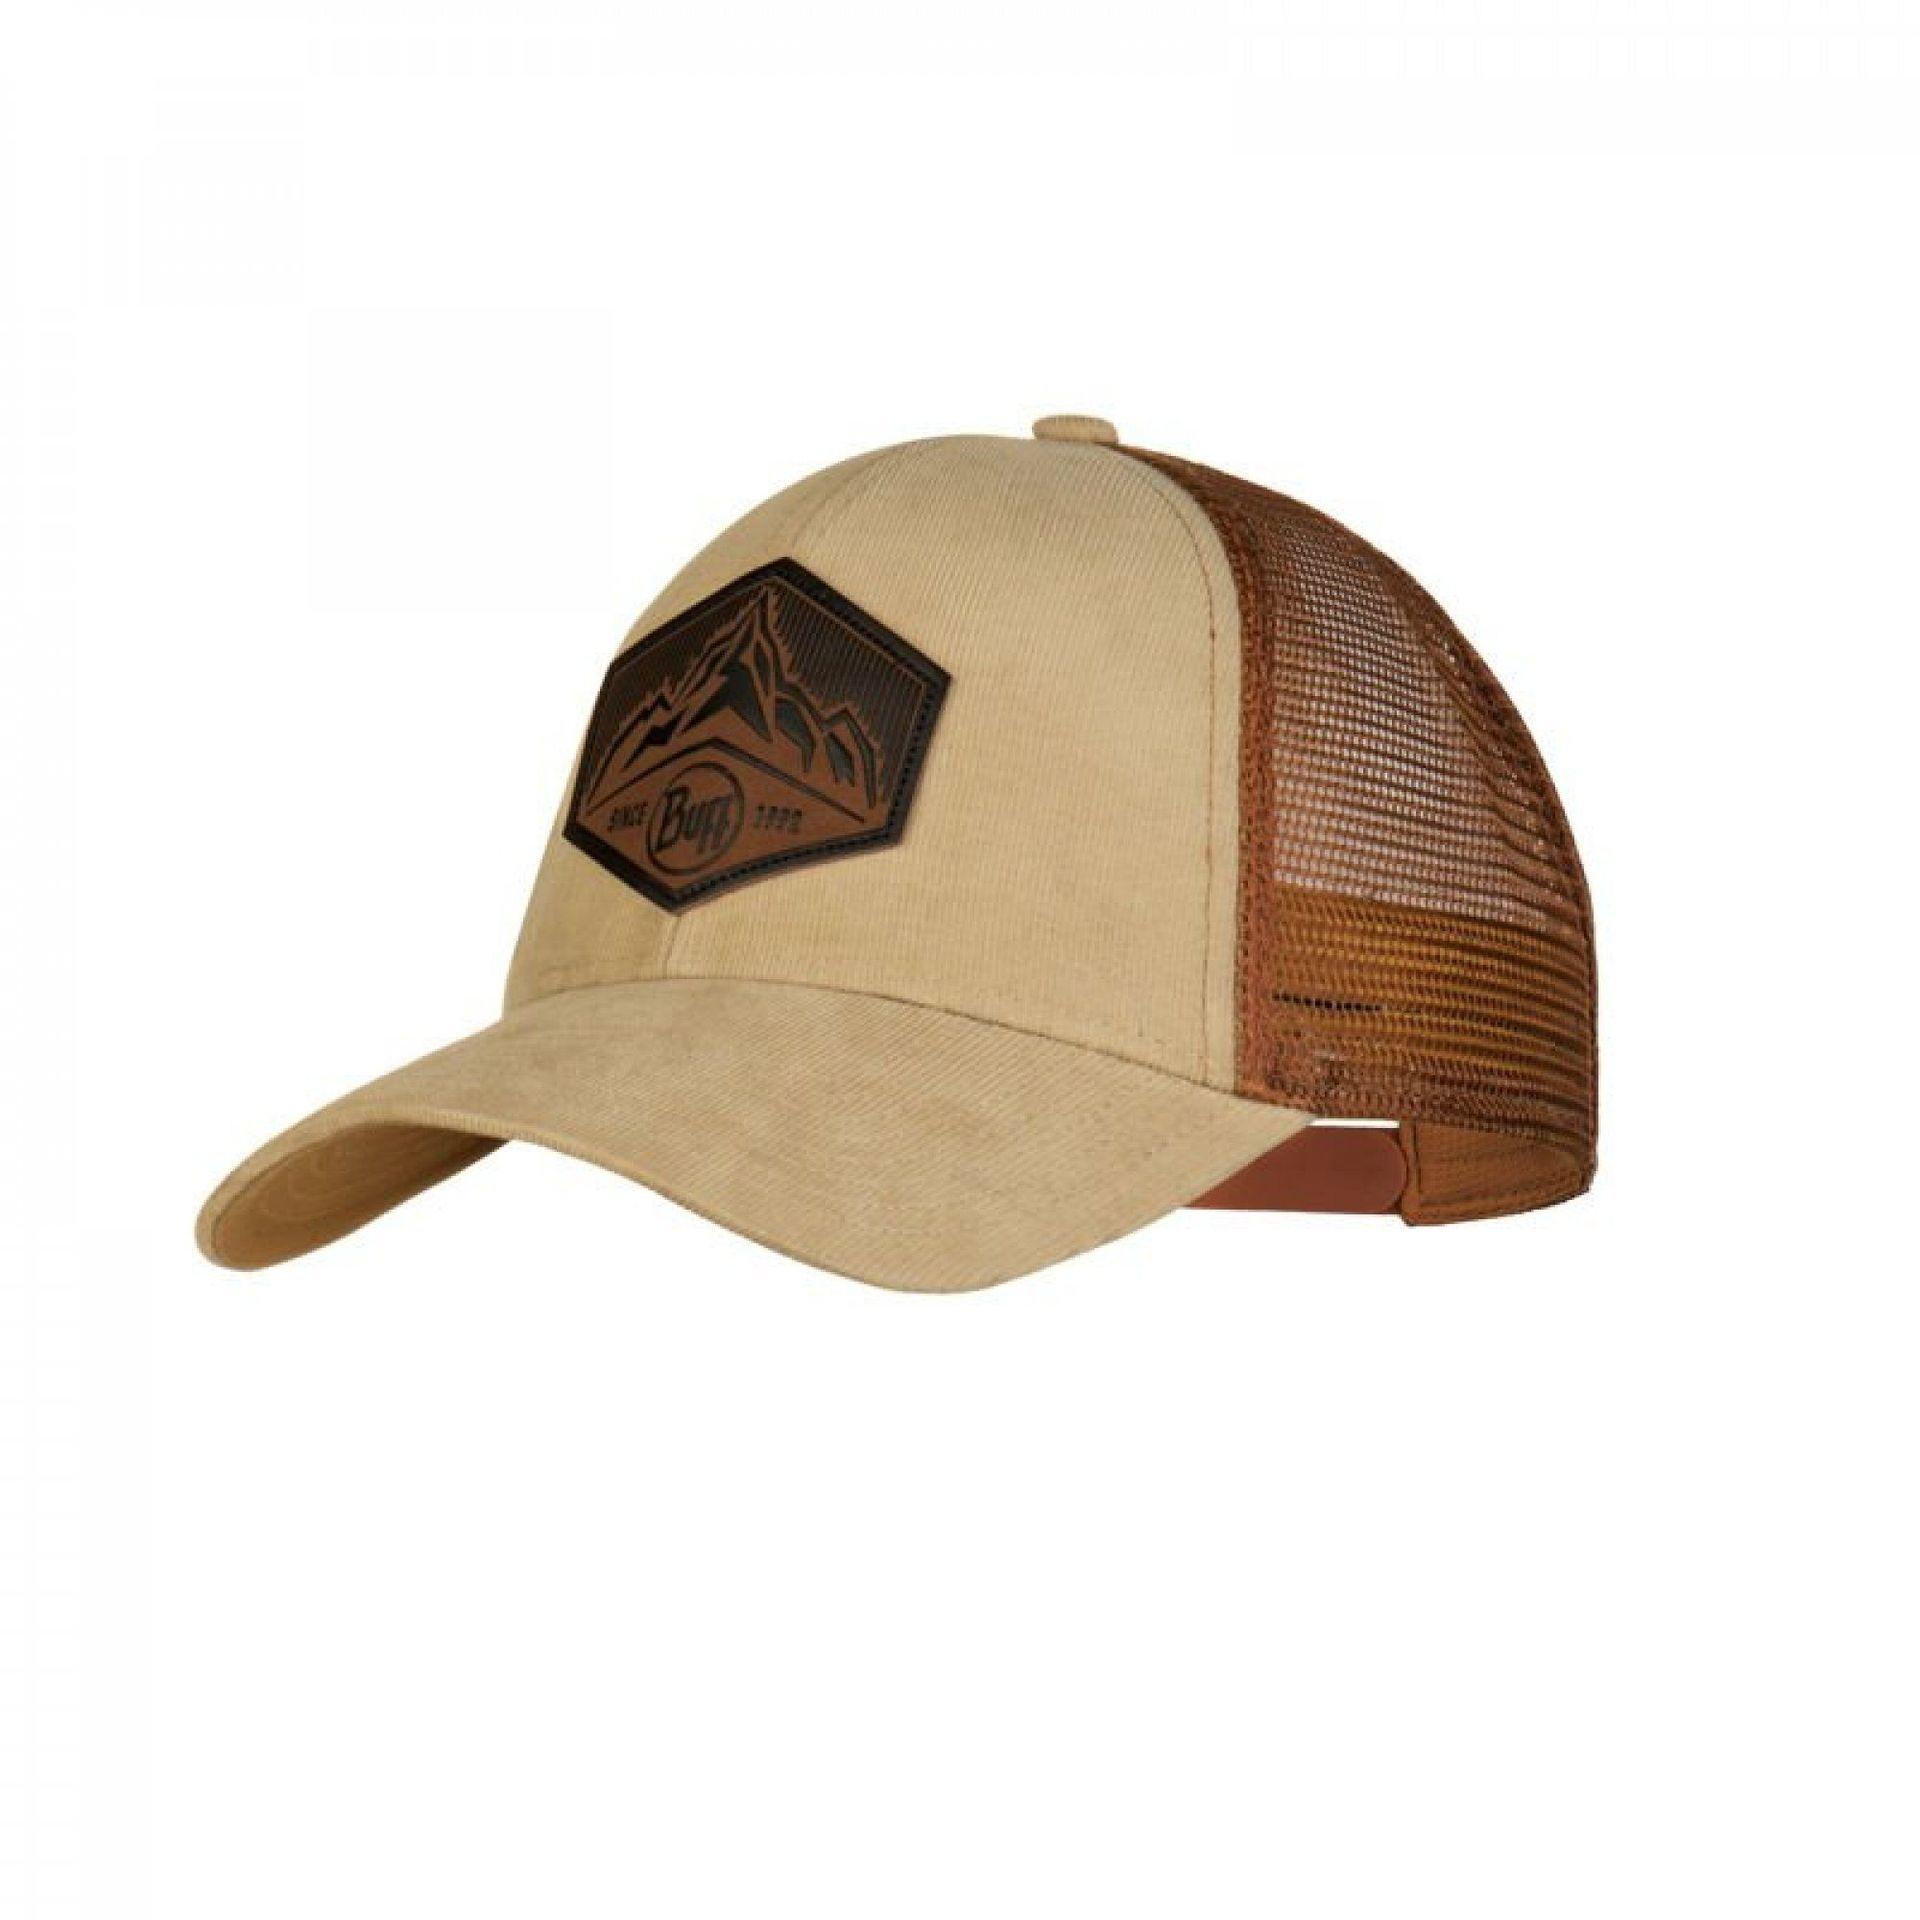 TRUCKER CAP KERNEL BRINDLE 2